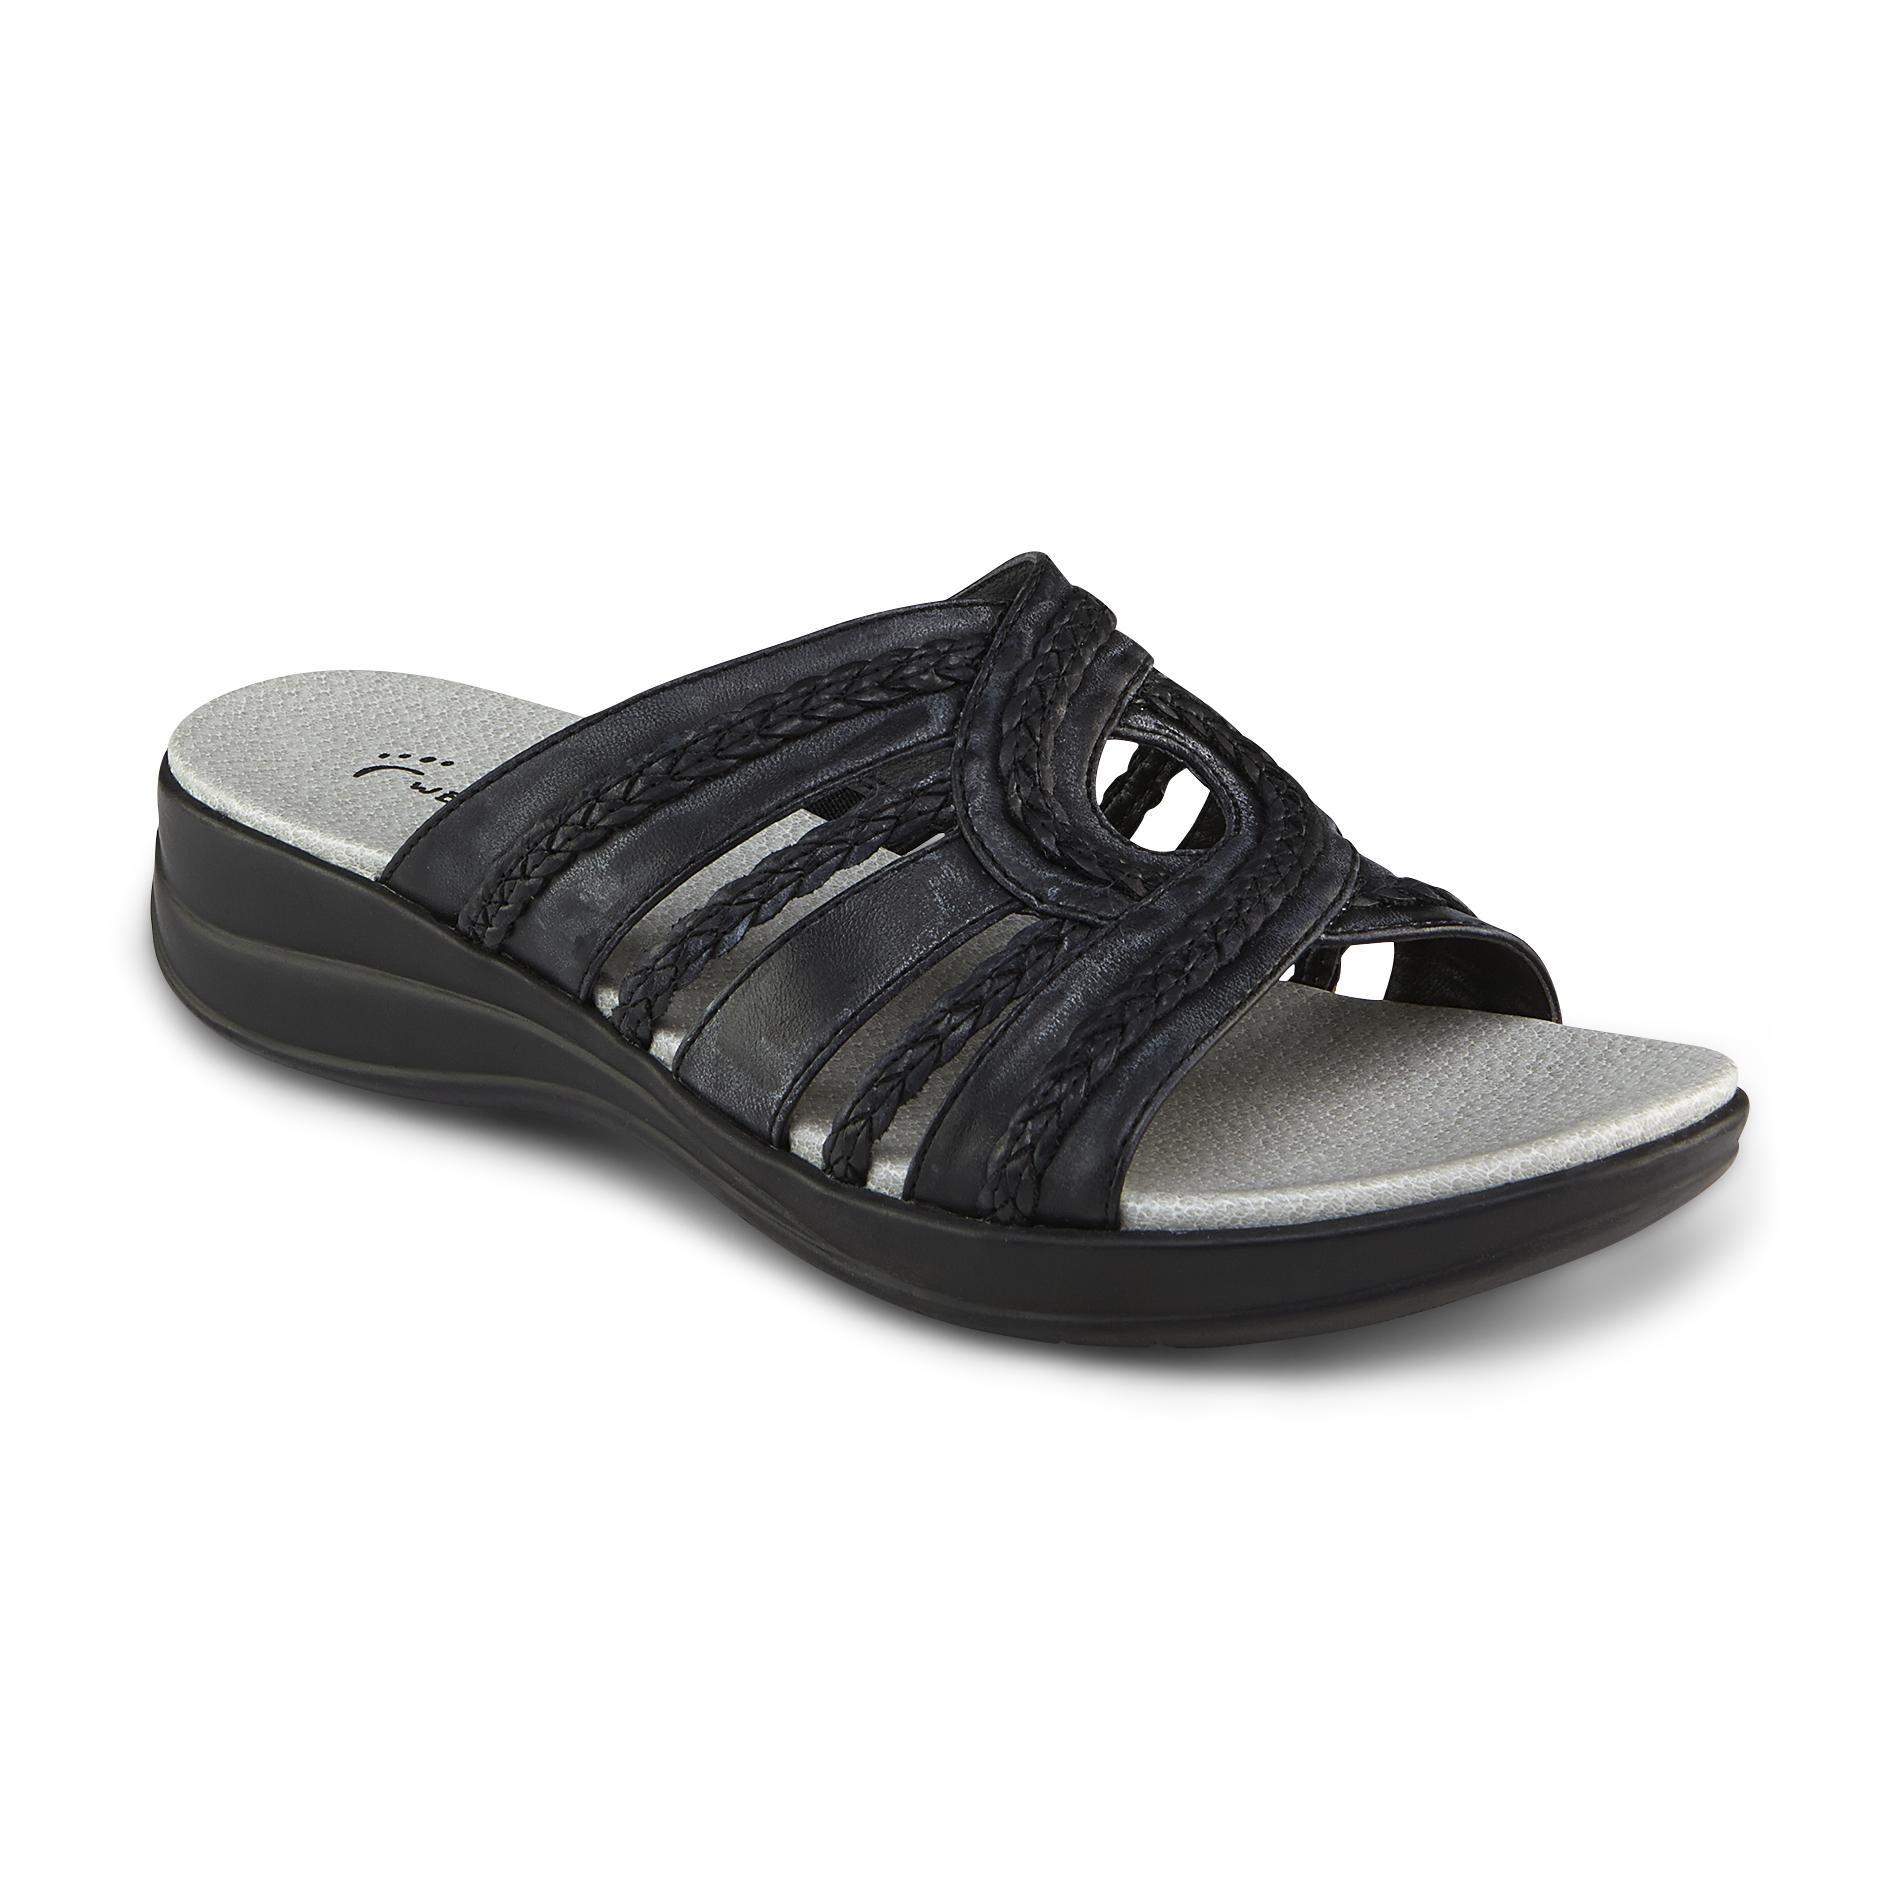 wear ever slide sandal sandals sears